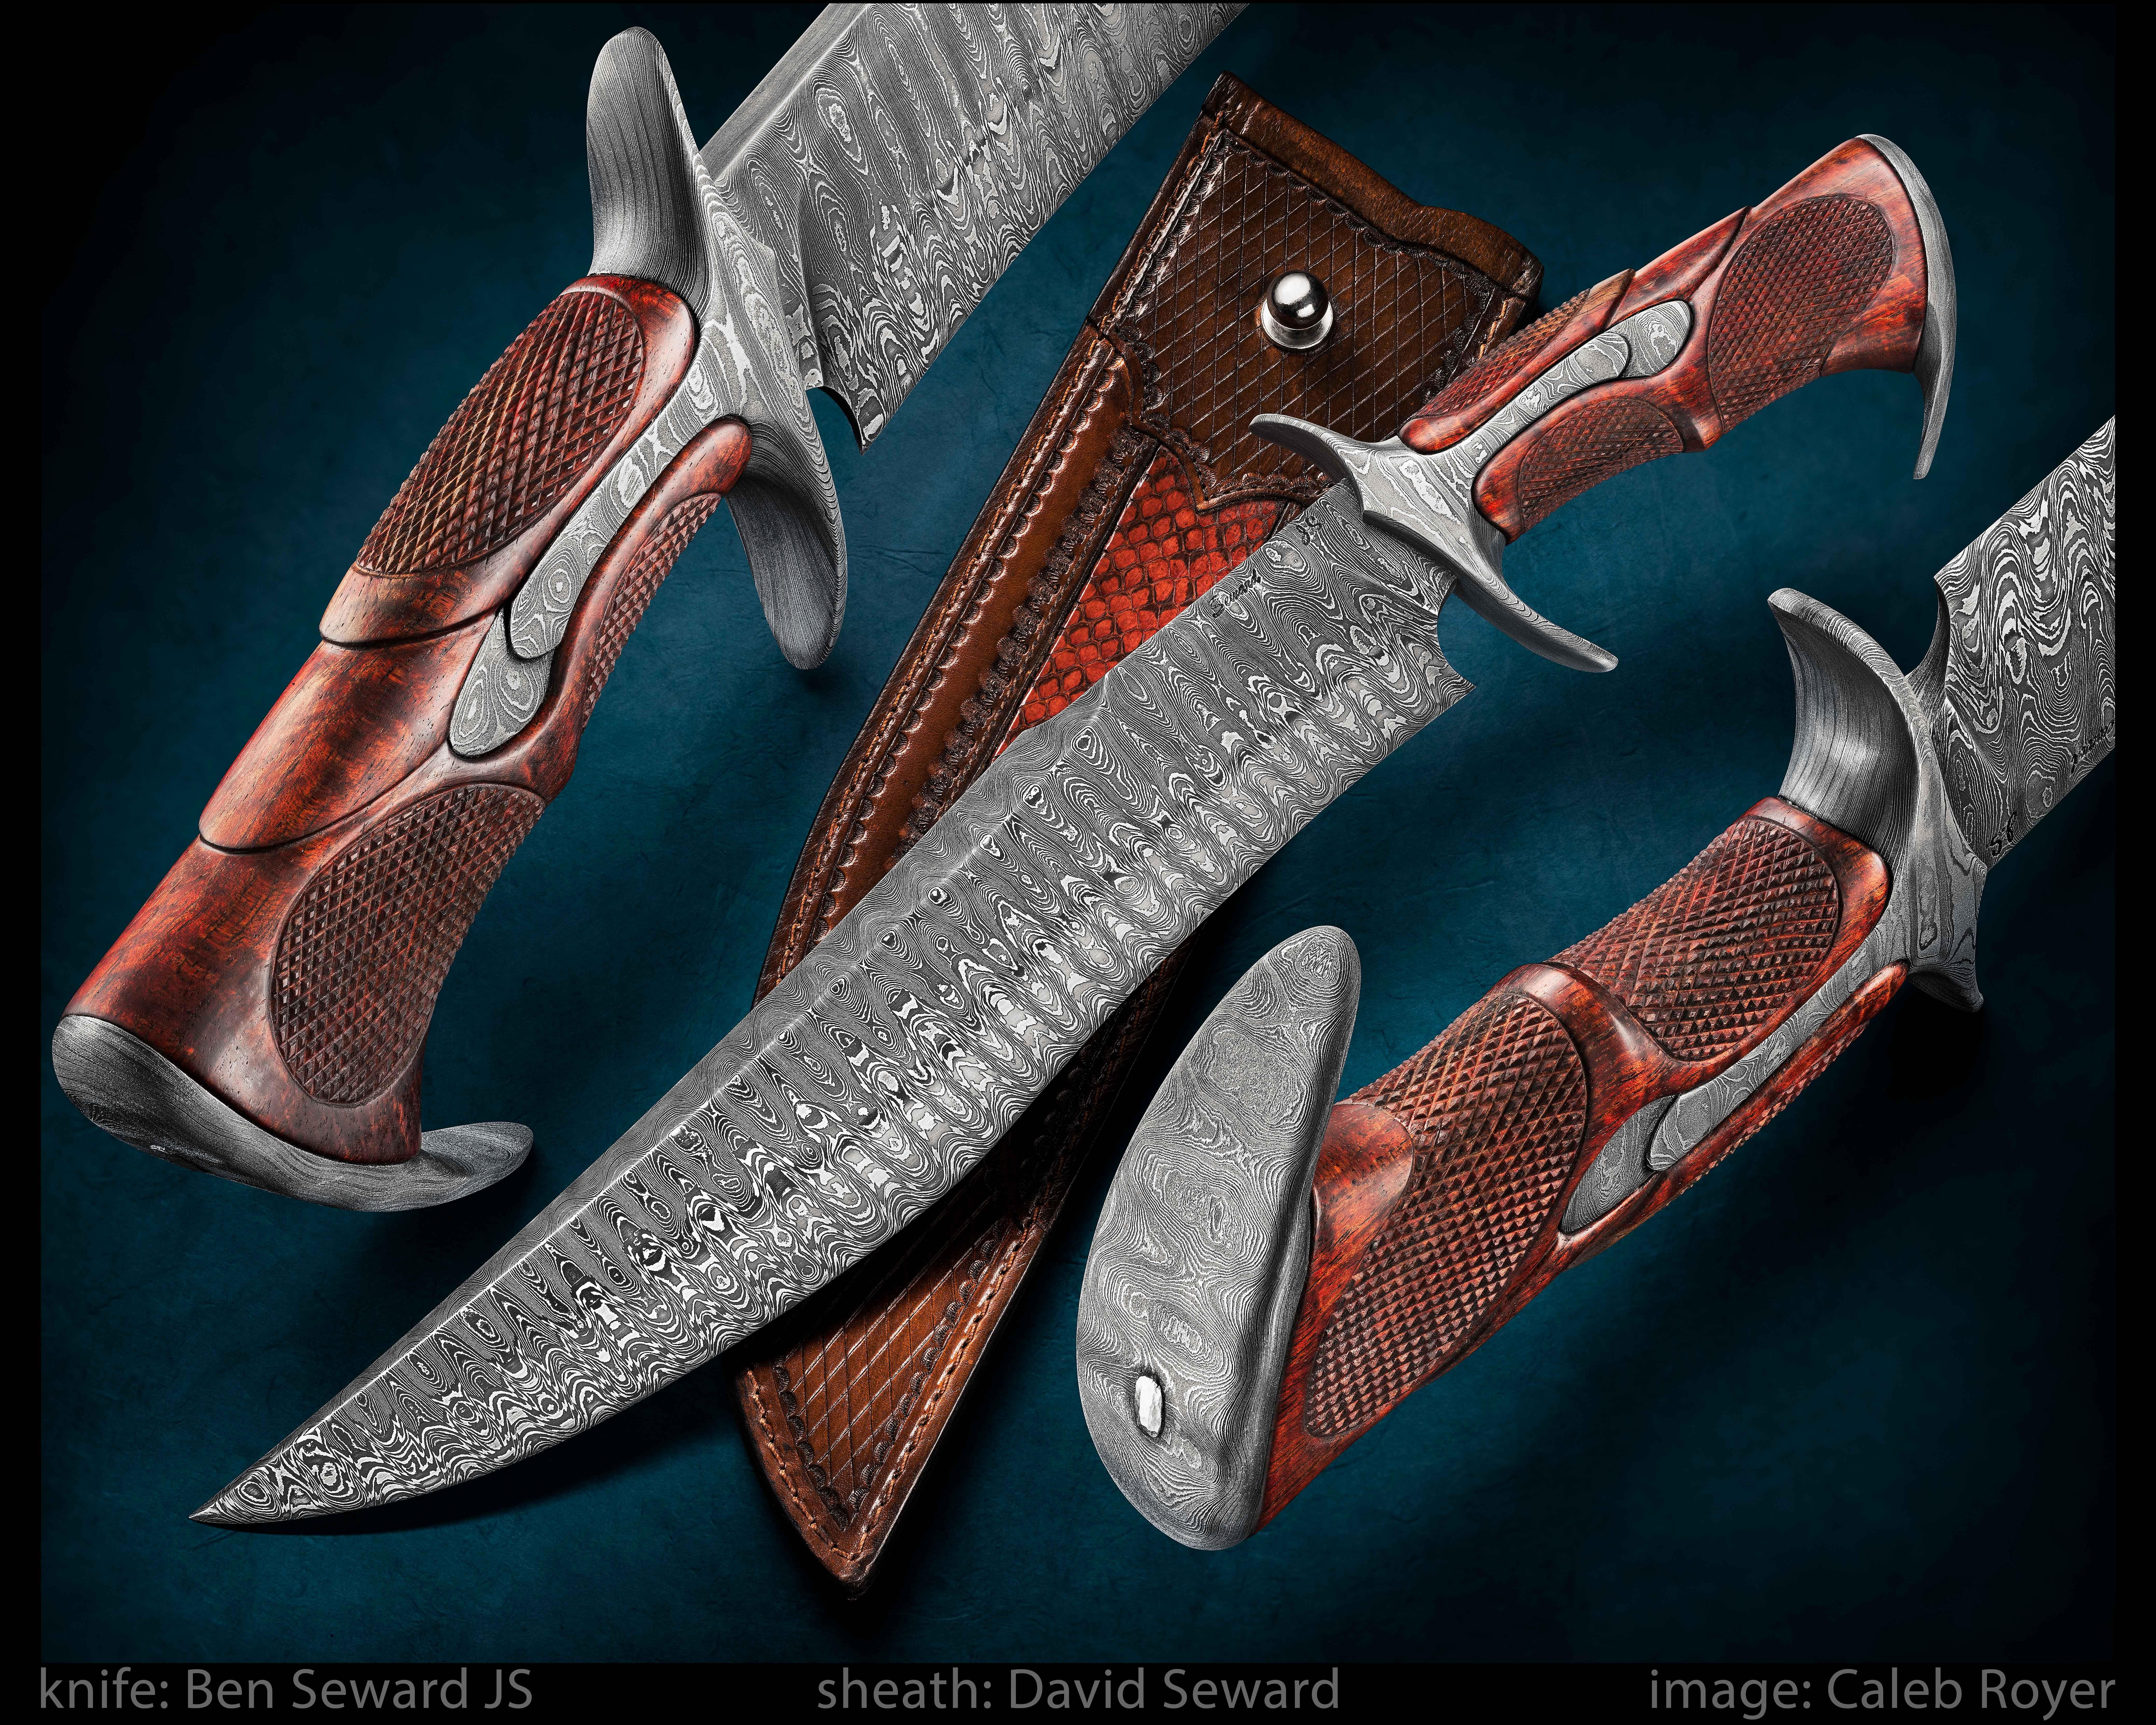 pleasant cool knives. Ben Seward Knives creates beautiful custom hand forged knives for all  purposes Pin by Paavo Aalto on Miekat puukot veitset Pinterest